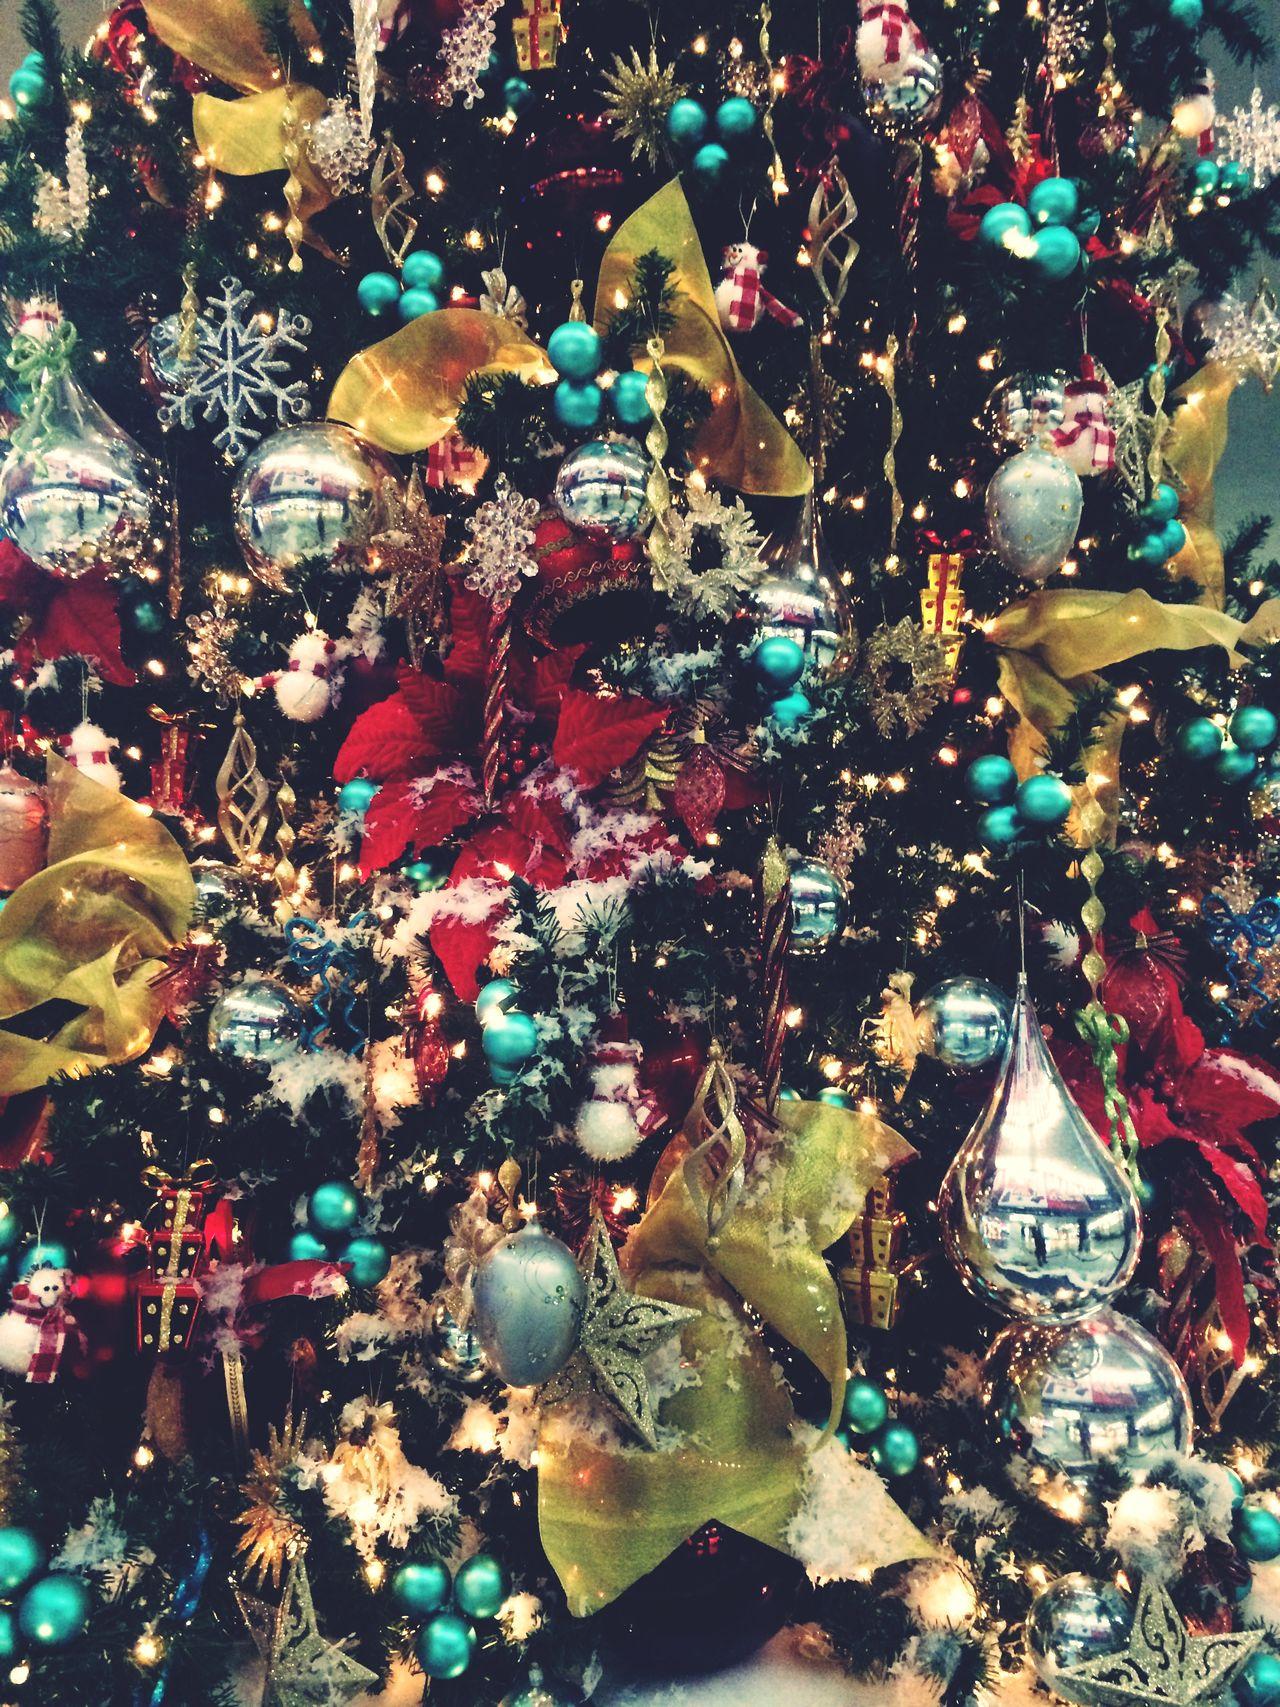 Glitter Xmas Christmas Tree Reflection Chistmas Ornament Holidays Winter Tree Decoration